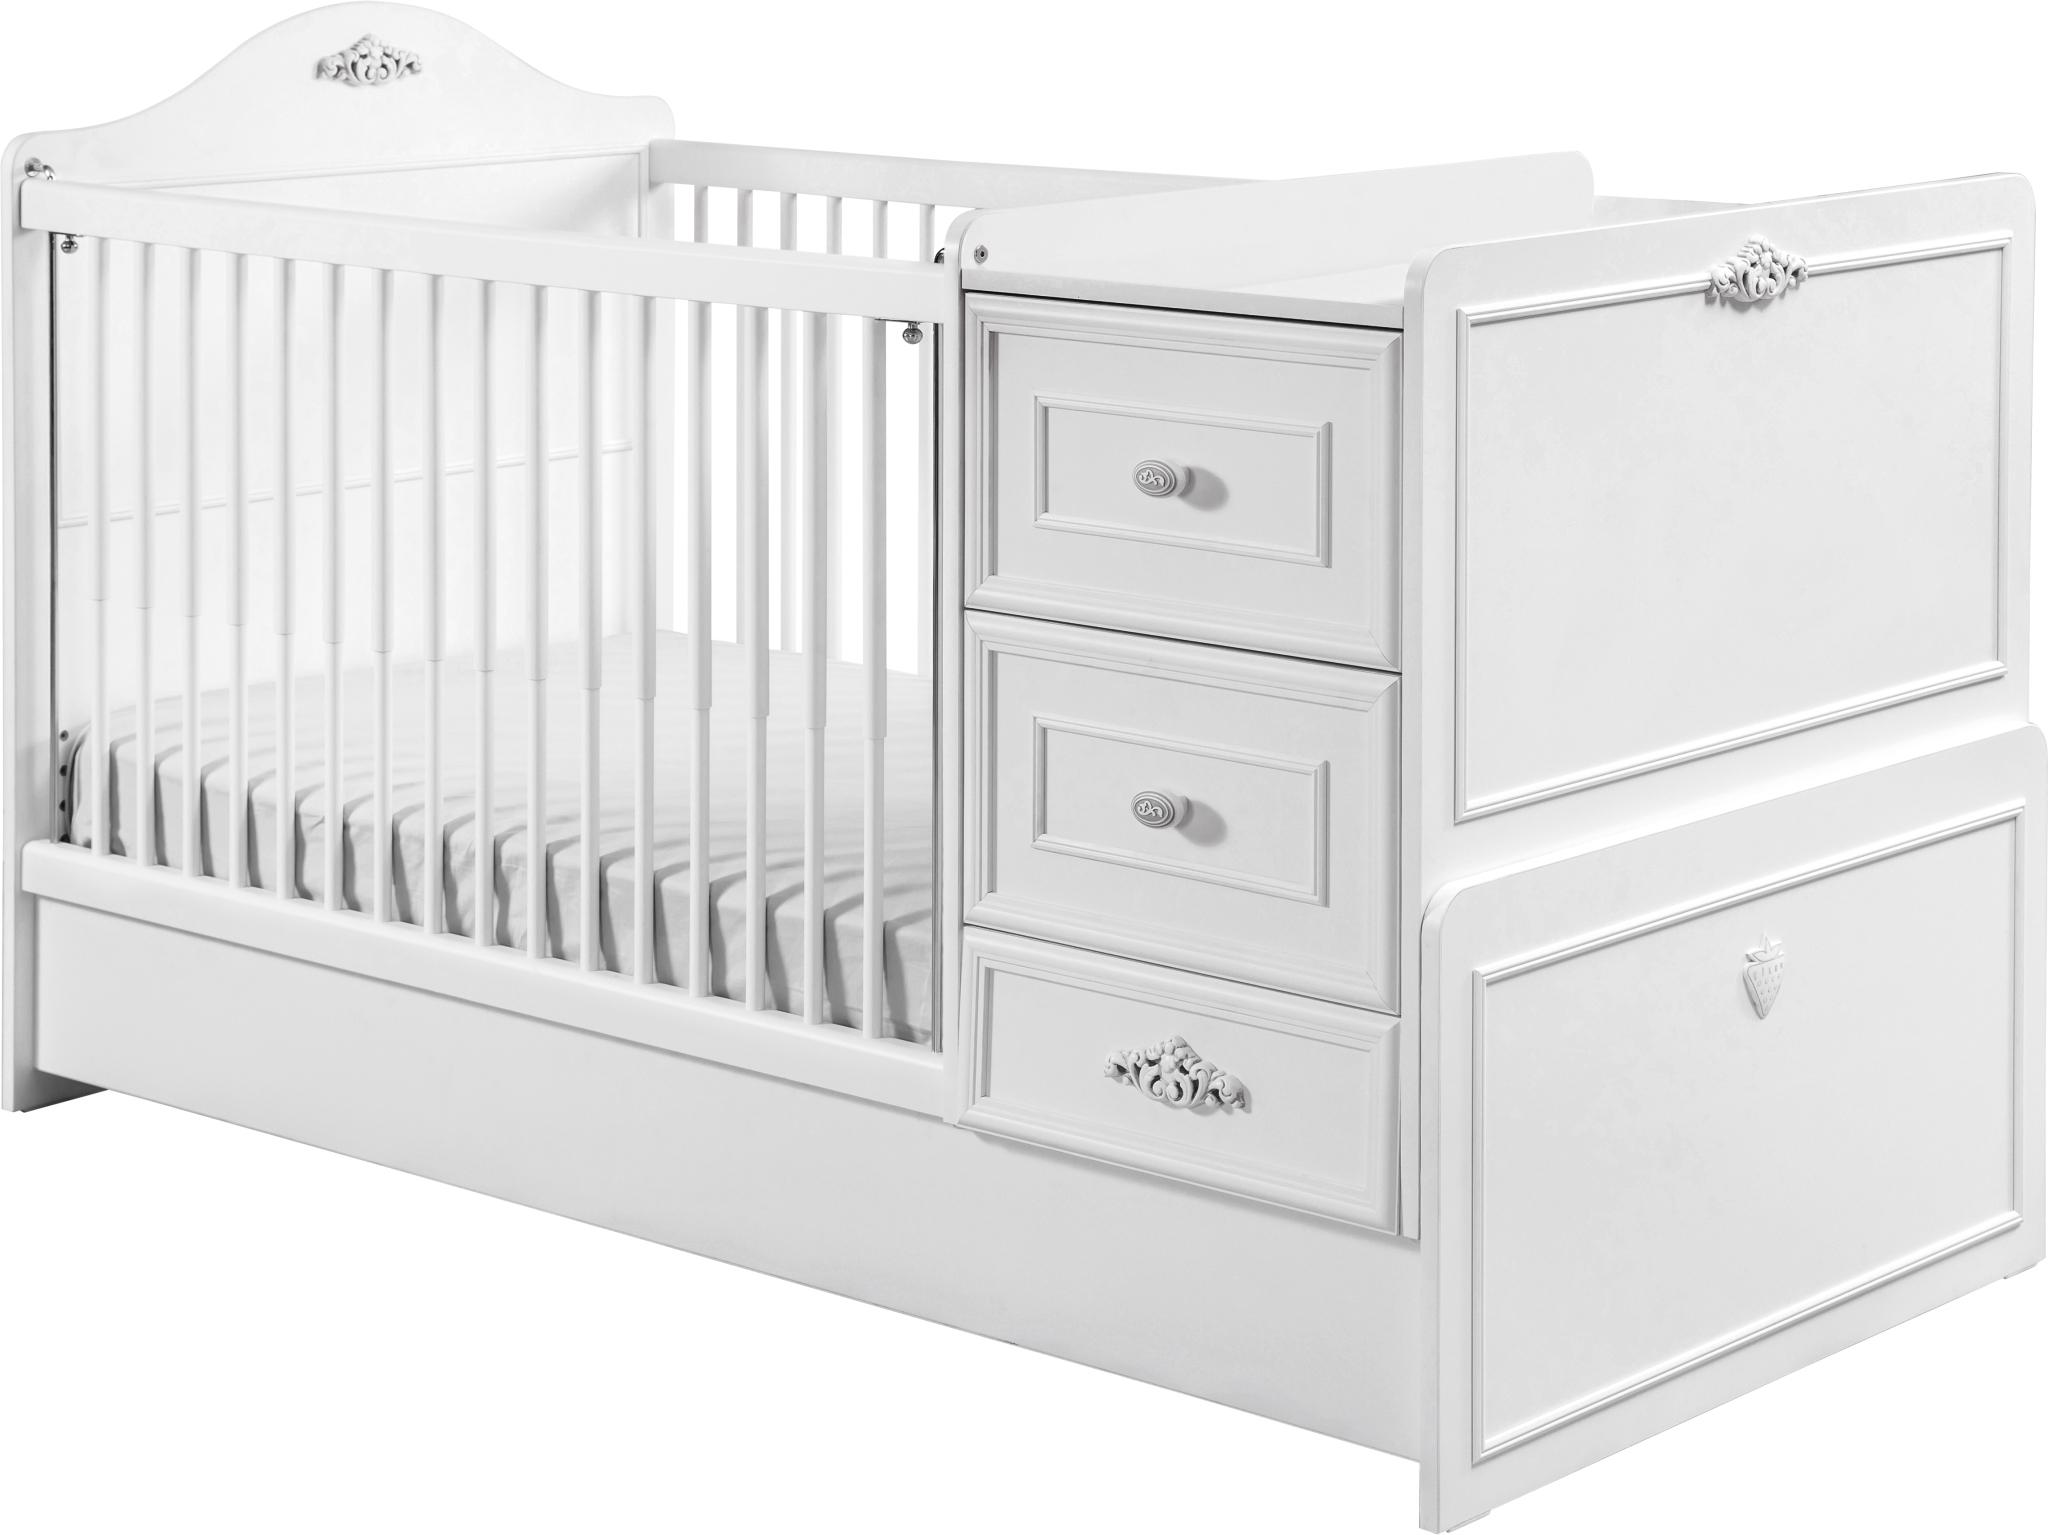 Patut Transformabil Pal Bebe Romantic Baby White